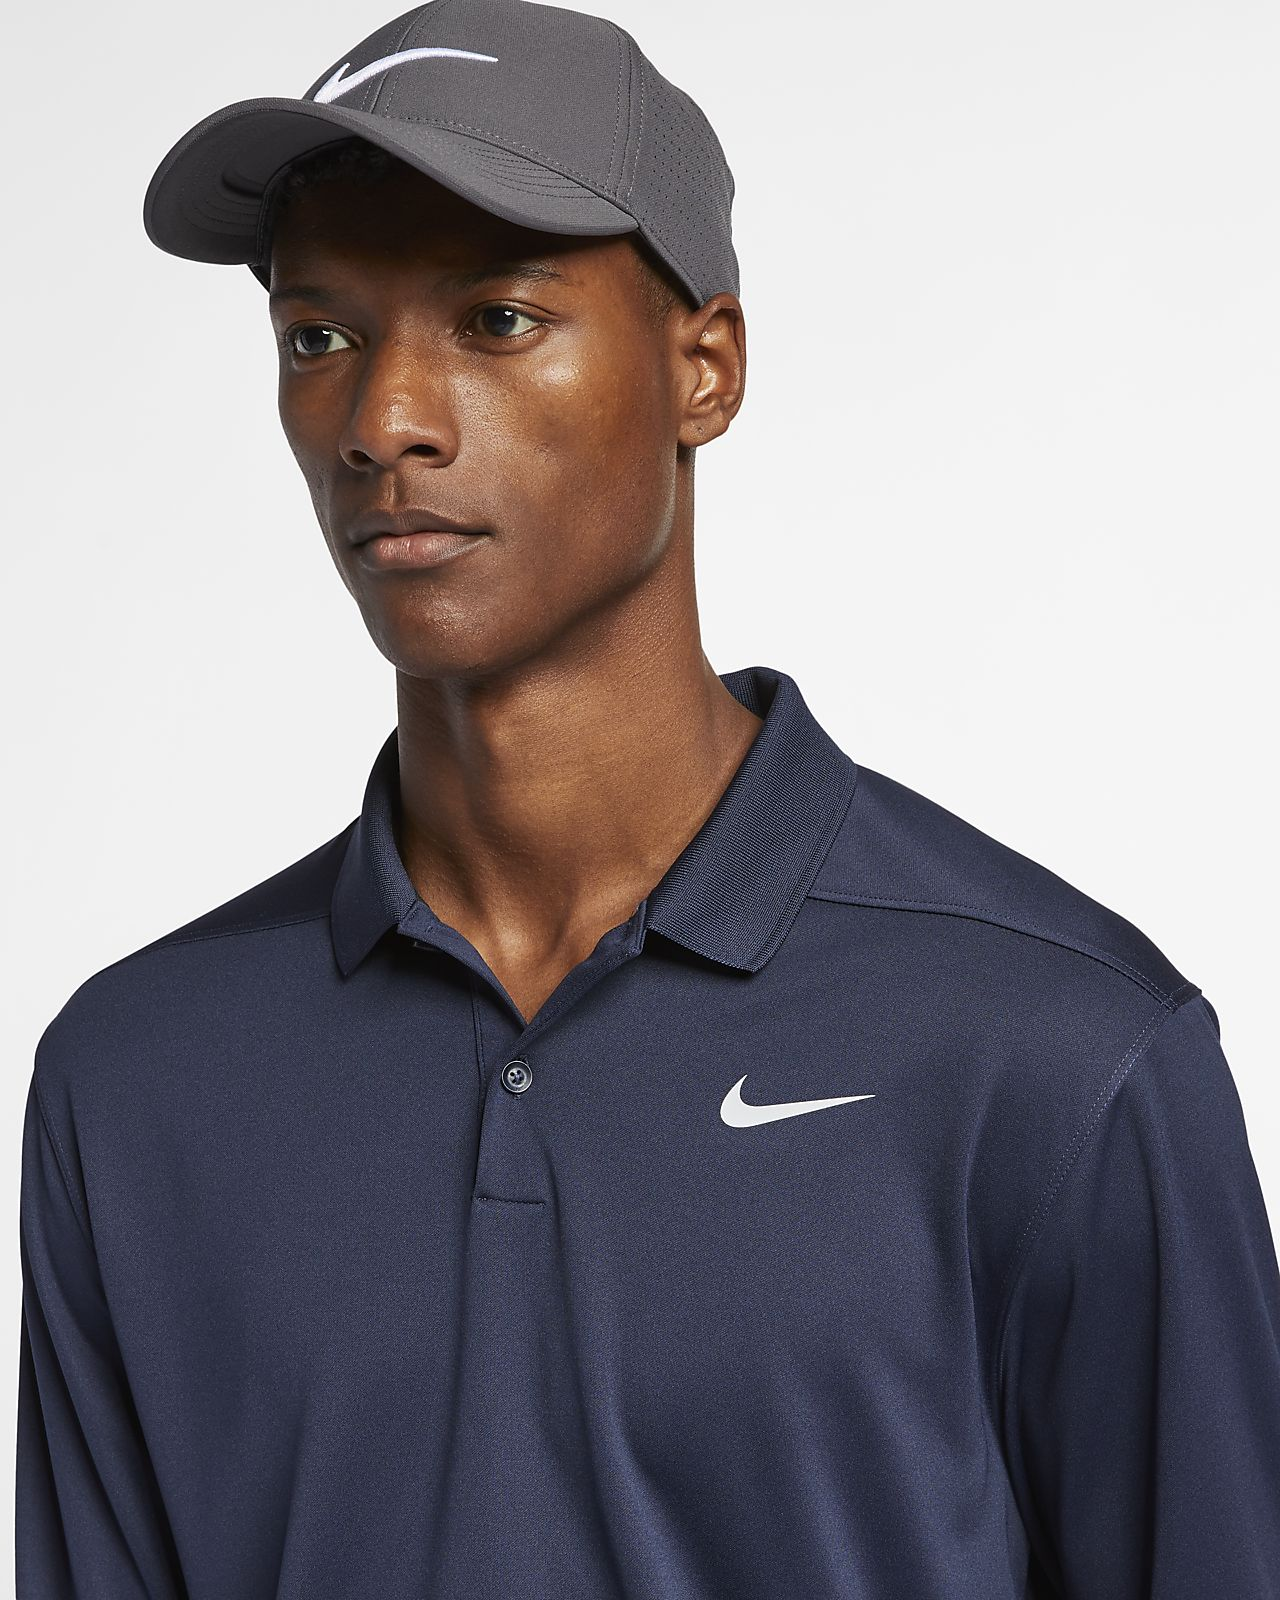 b7f93f075 Nike Dri-FIT Victory Men s Golf Polo. Nike.com